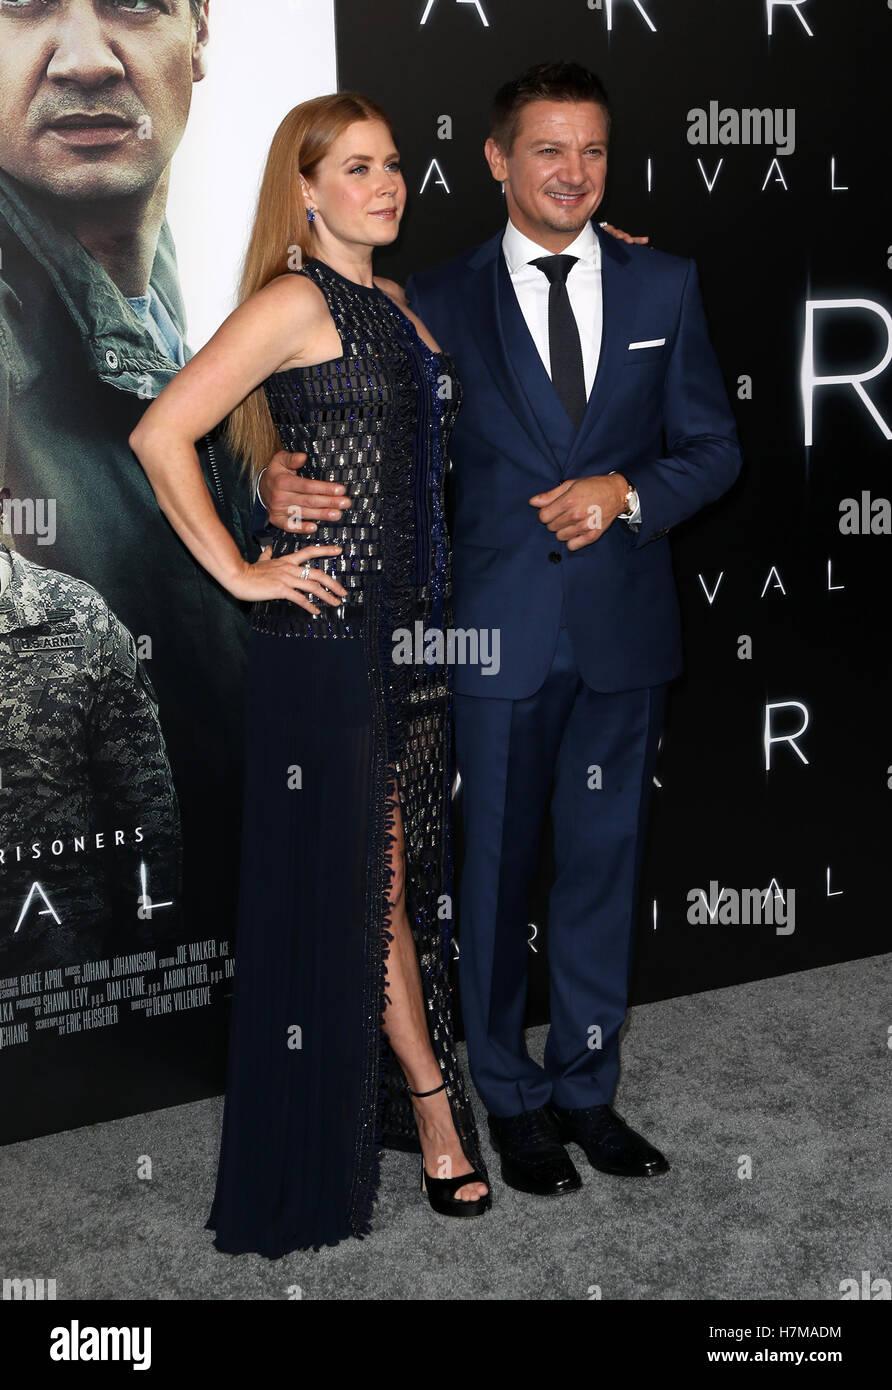 "Westwood, CA. 6 Nov, 2016. Amy Adams, Jeremy Renner a Premiere di Paramount Pictures' "" arrivo "" al Immagini Stock"